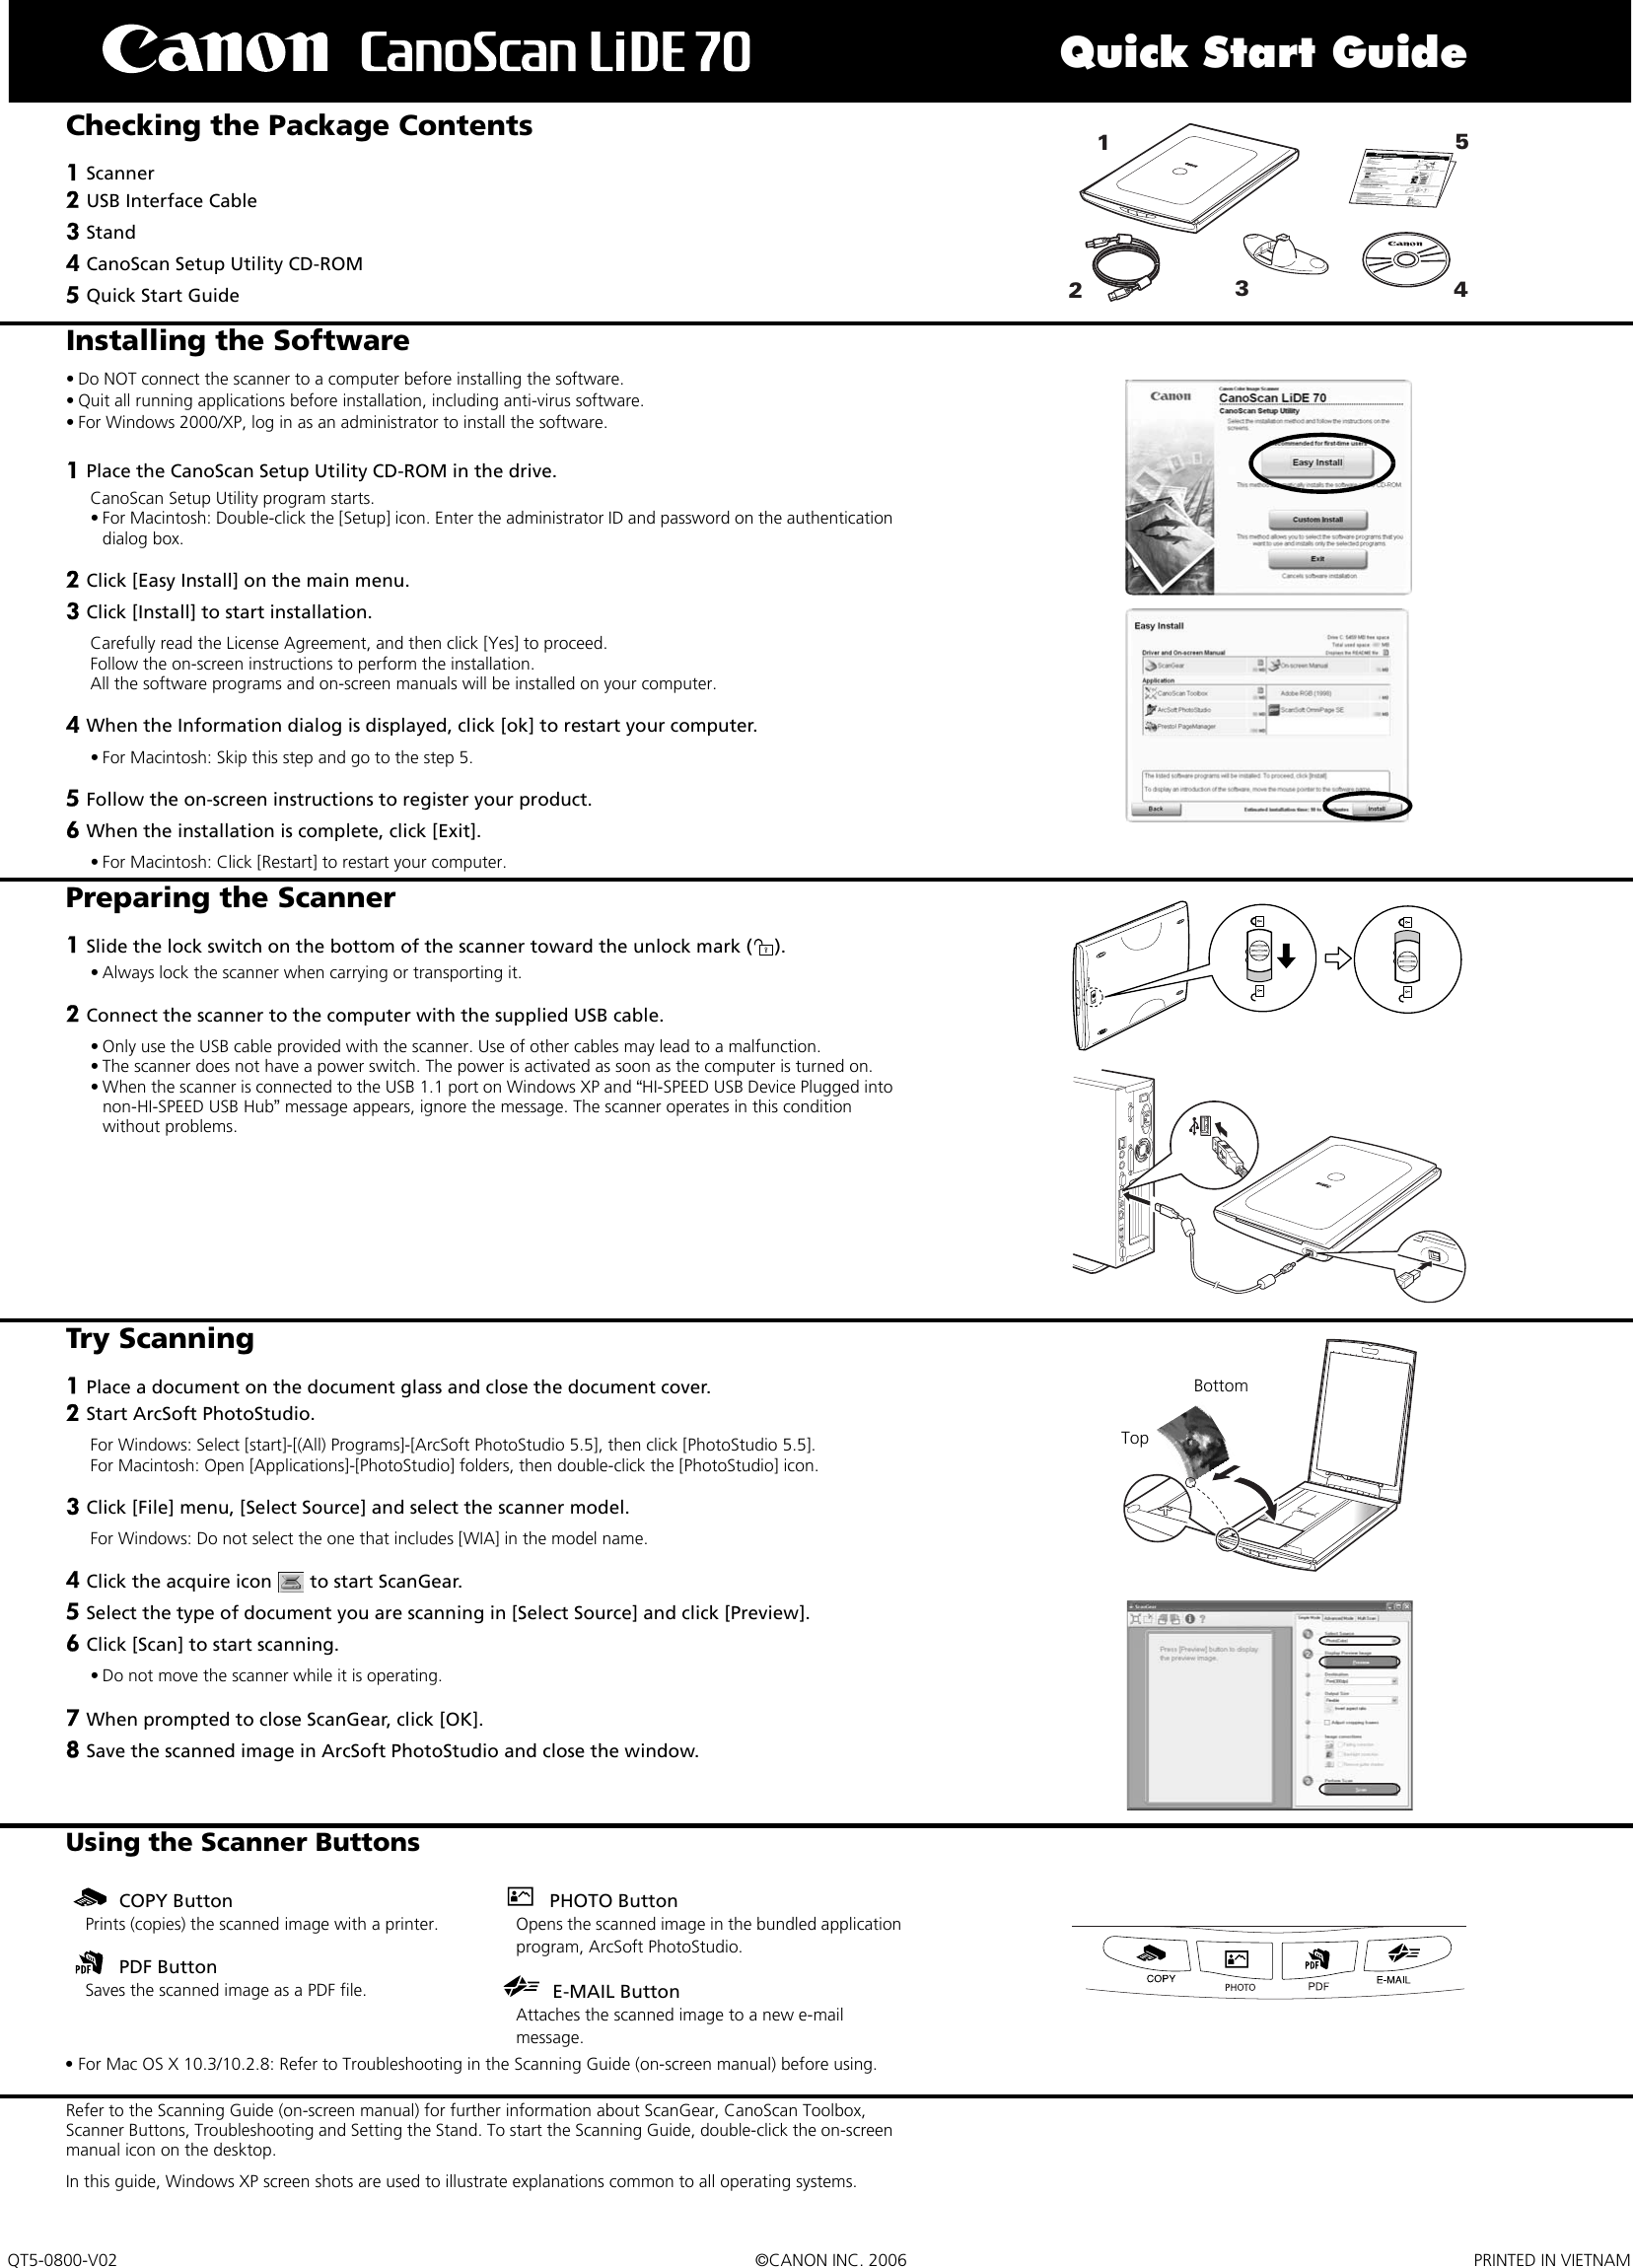 arcsoft photostudio 6 manual